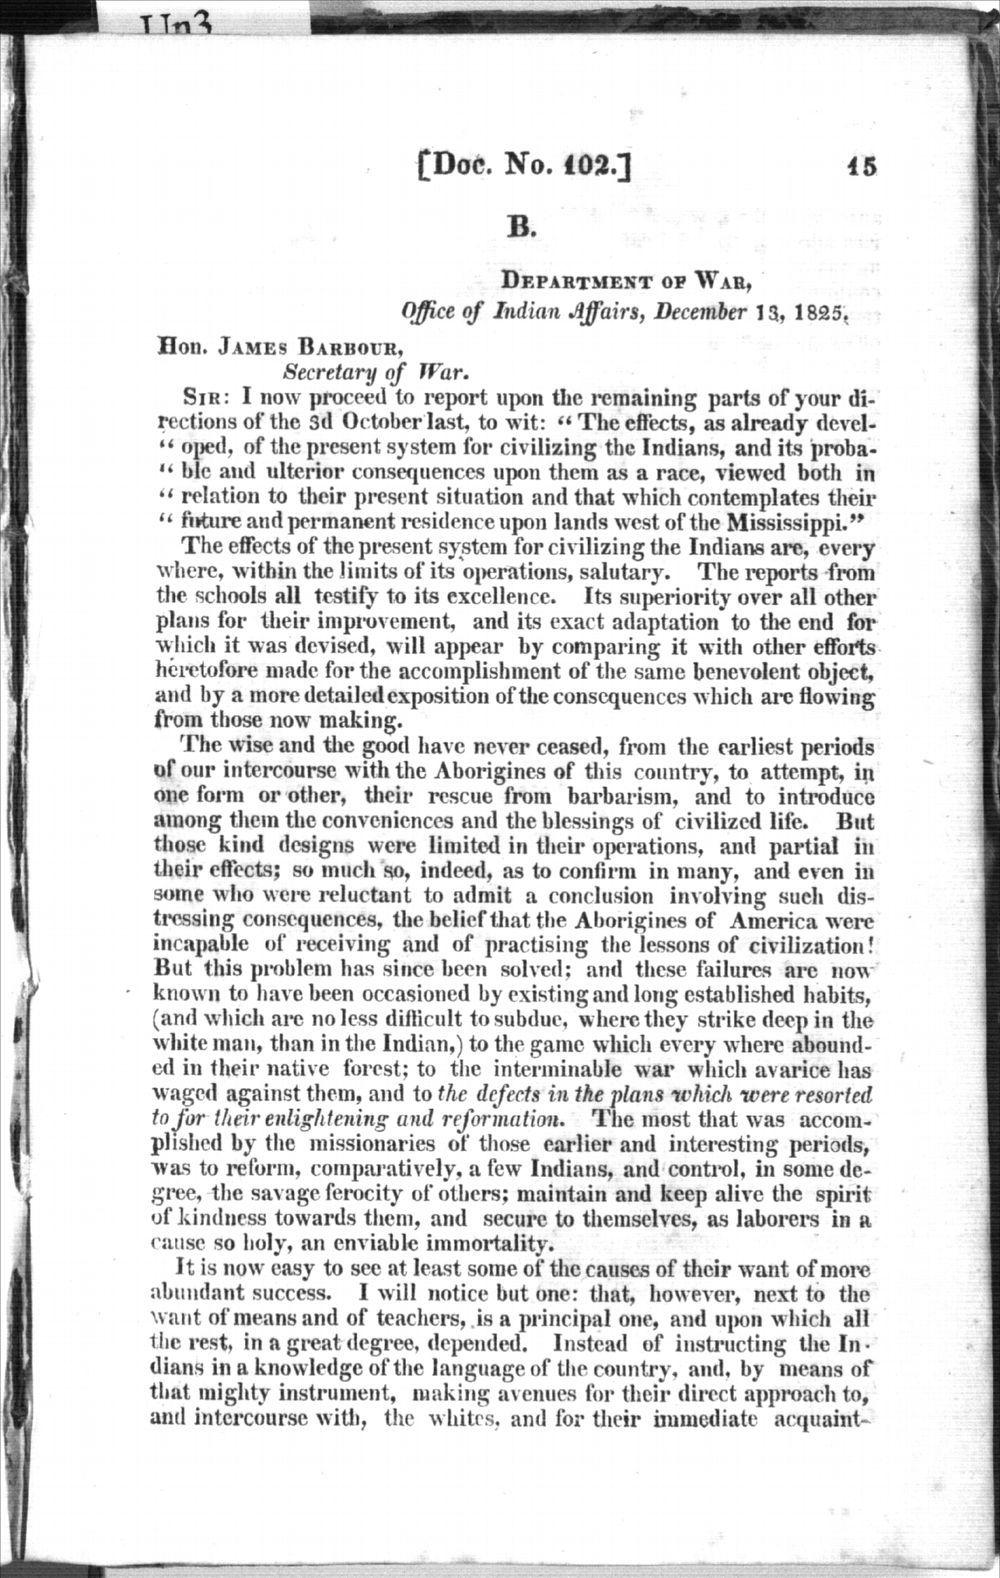 Thomas L. McKenney to James Barbour - 1